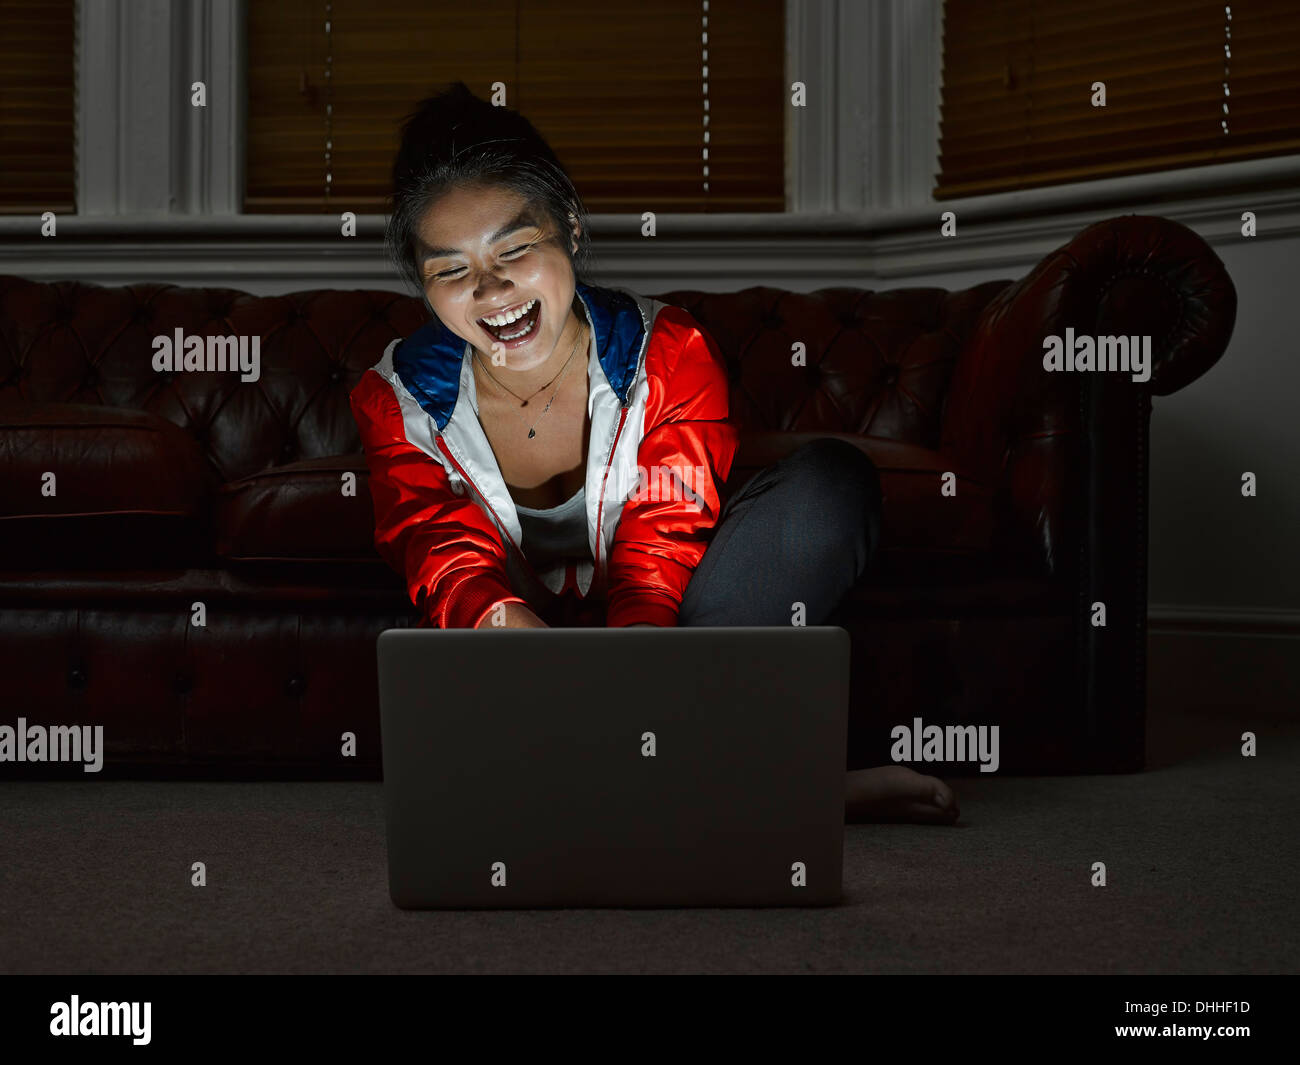 Junge Frau am Boden lachen über digital-Tablette Stockbild